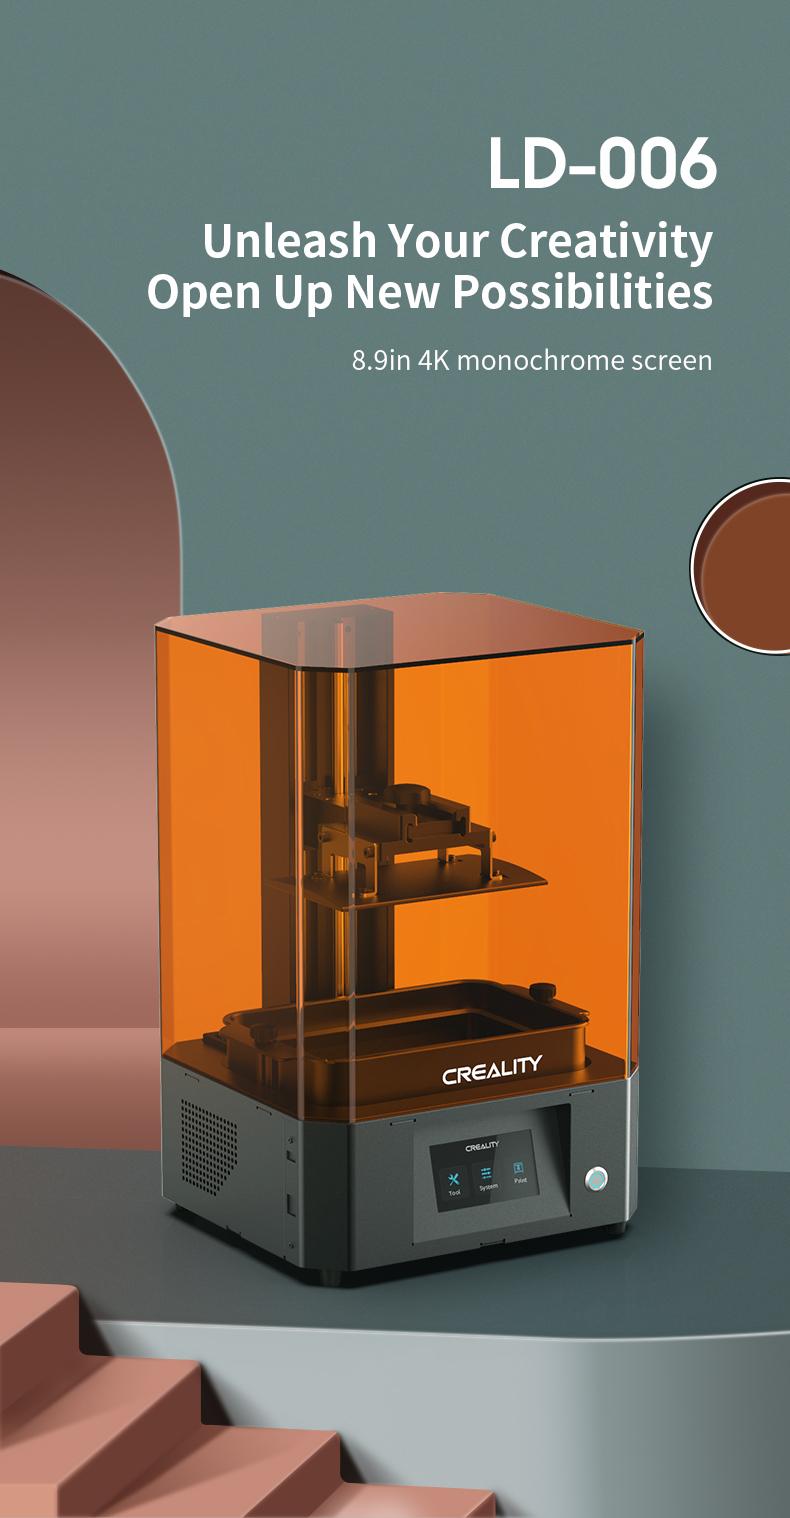 [Trả góp 0%]Máy in 3d ResinCreality LD-006 4K khổ in 192*120*250mm